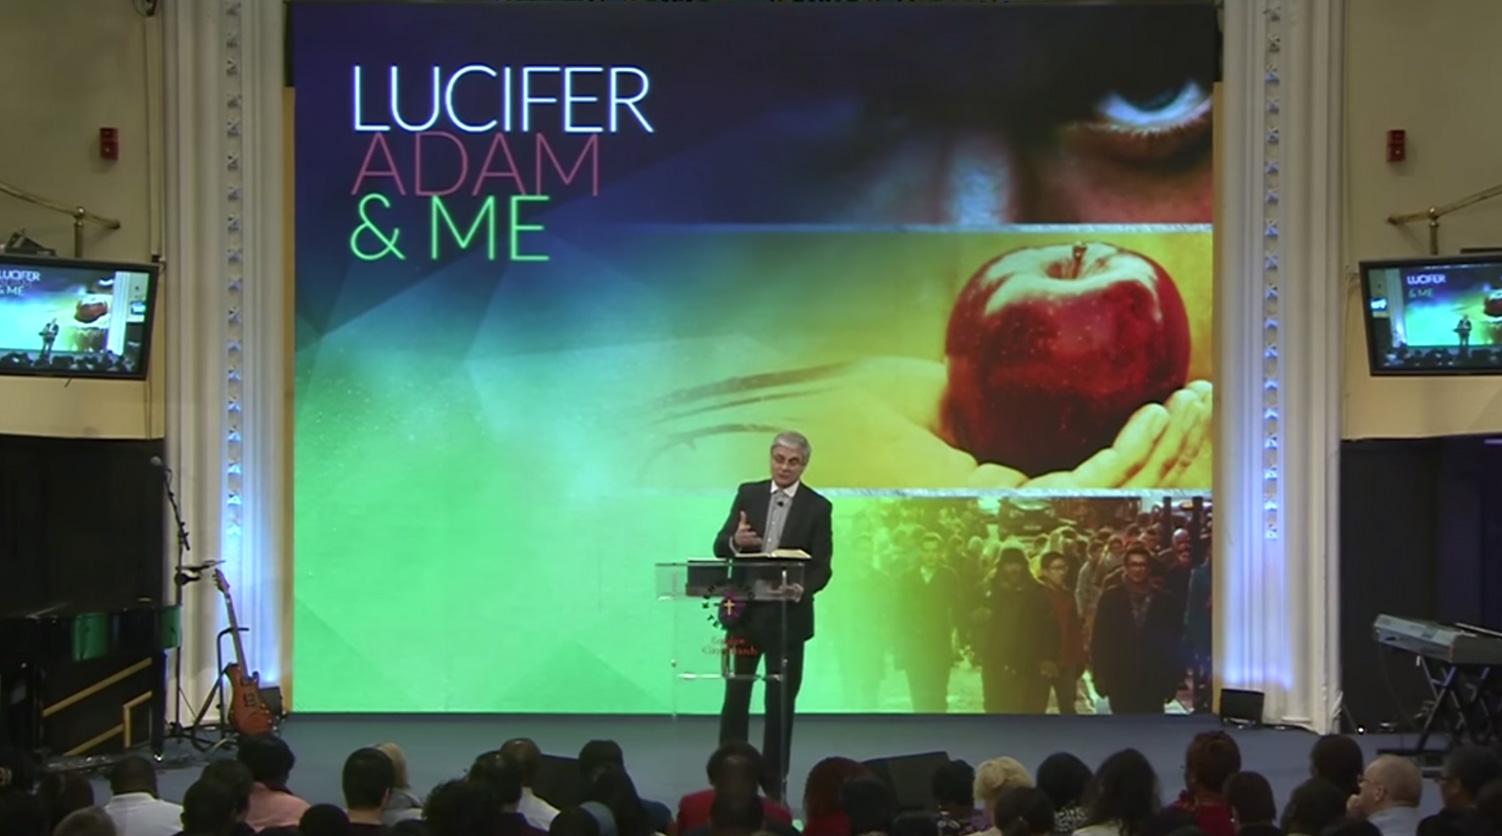 Lucifer, Adam and Me